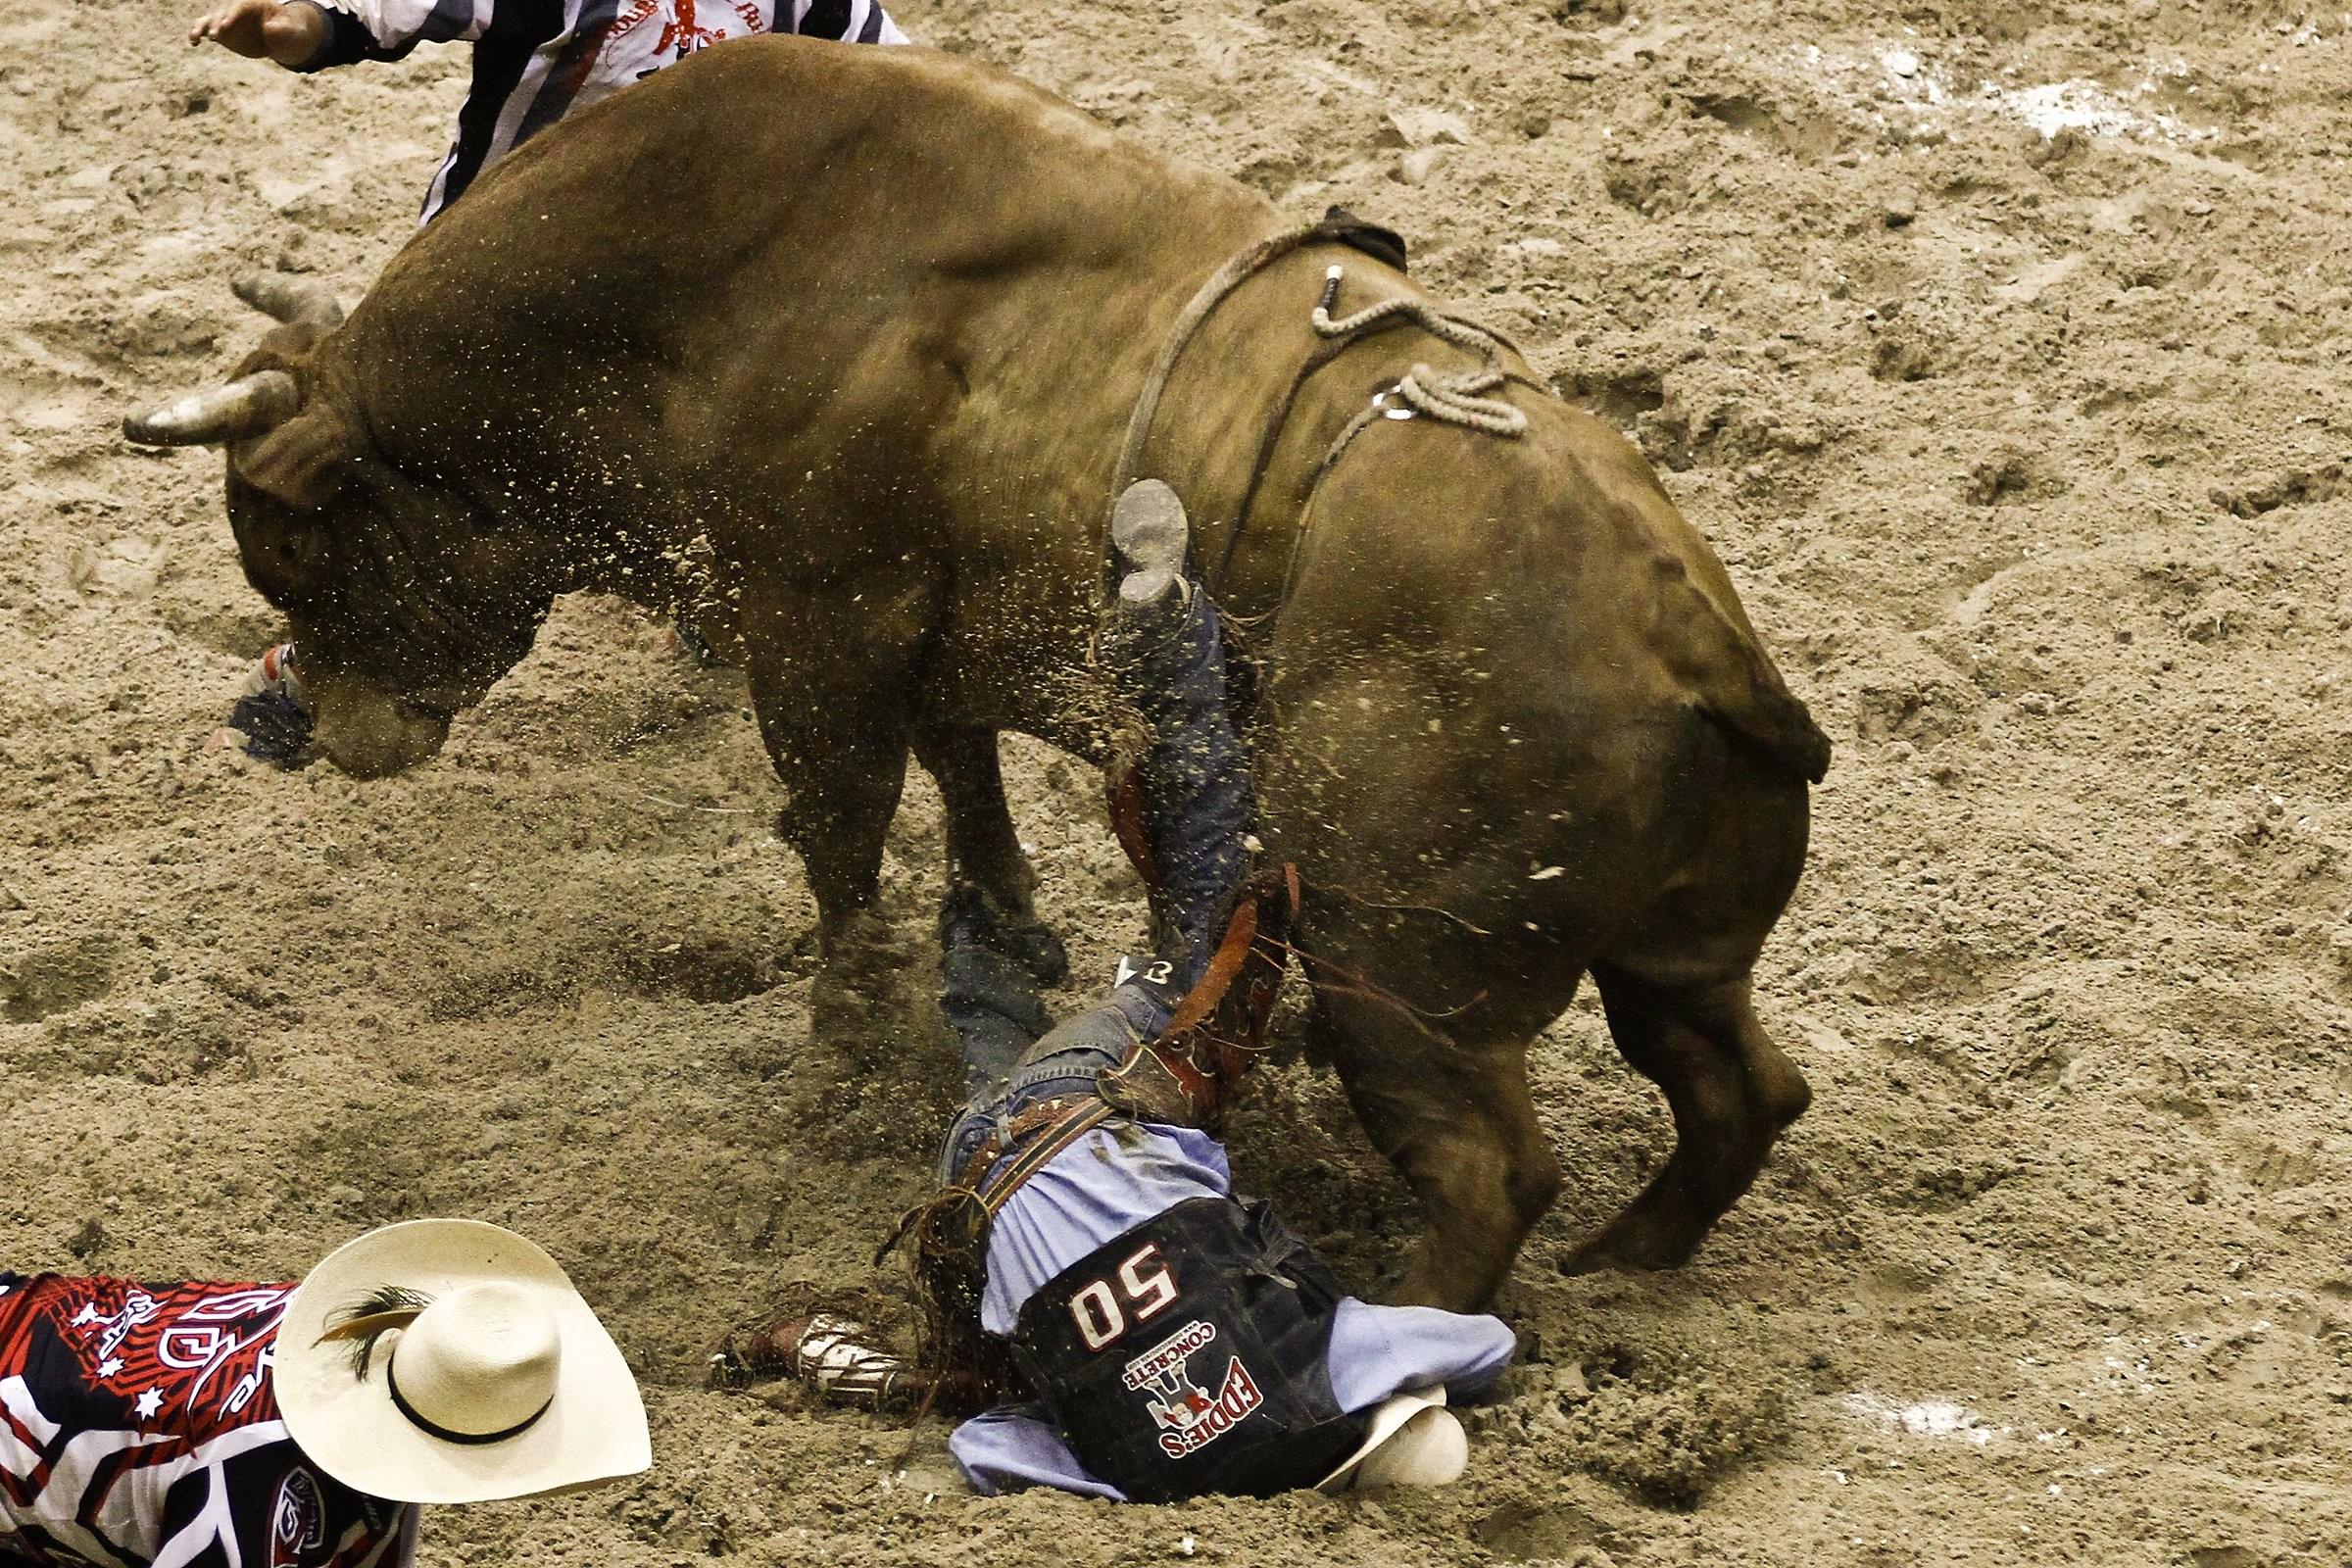 Res: 2400x1600, Bull riding bullrider rodeo western cowboy extreme cow (20)_JPG wallpaper |   | 298690 | WallpaperUP